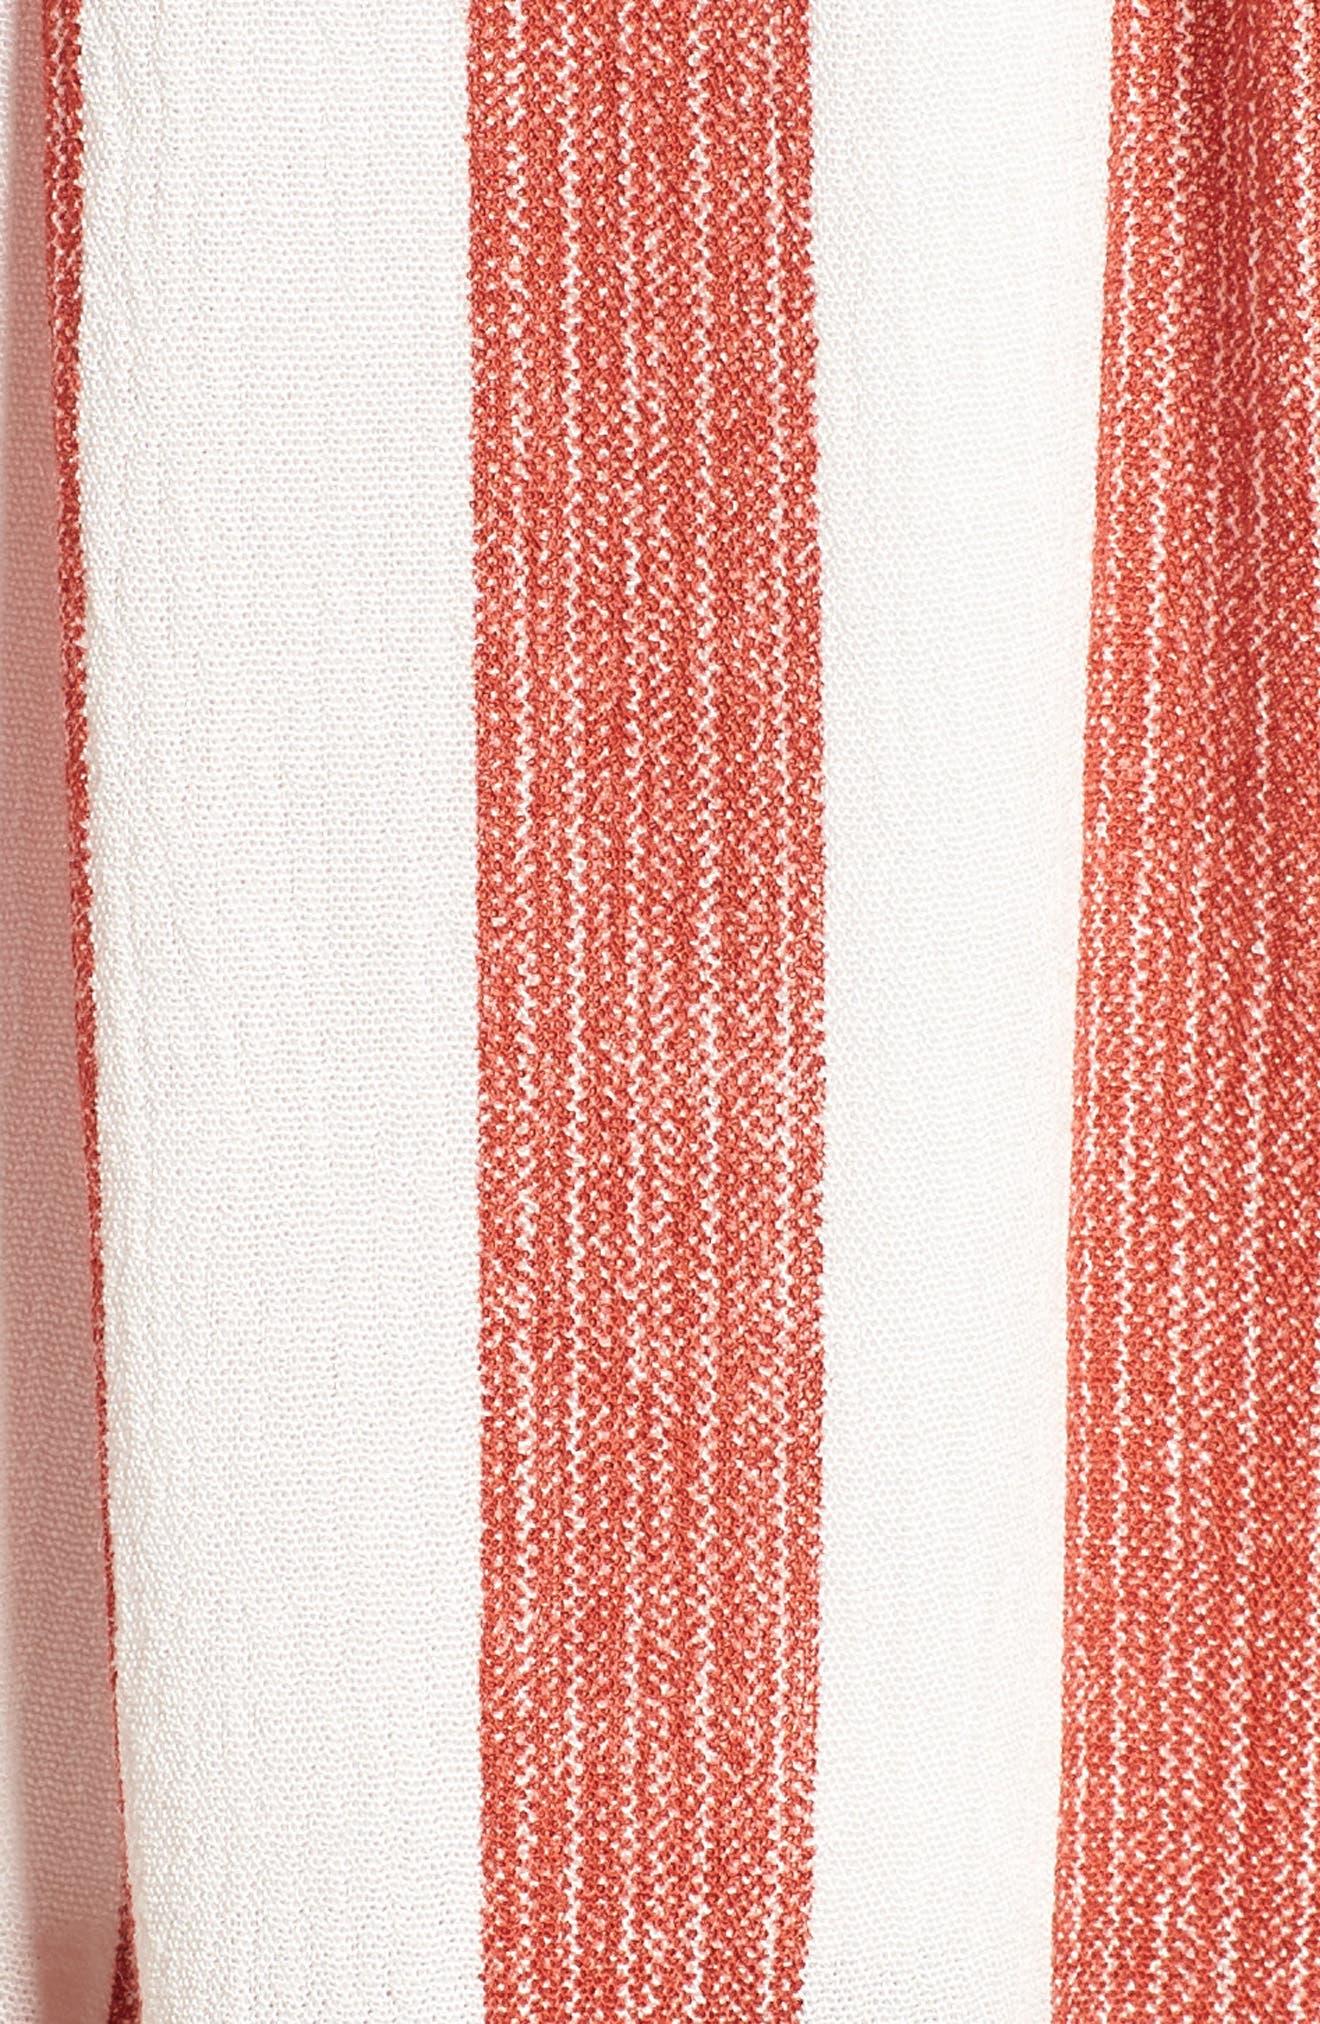 Stripe Shorts,                             Alternate thumbnail 6, color,                             Red/ Ivory